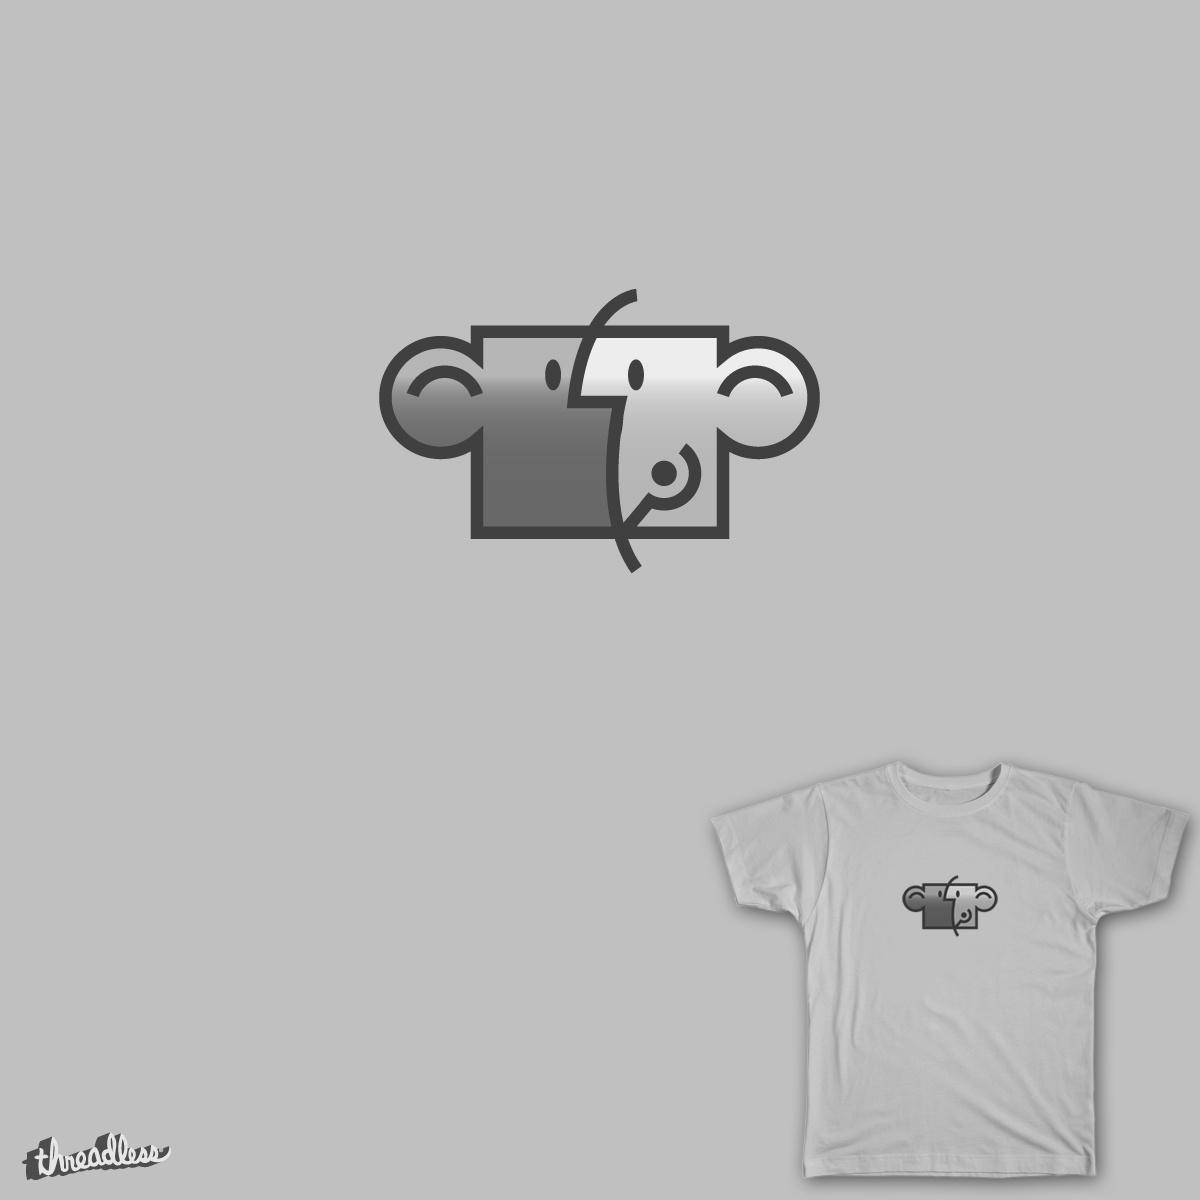 Mac Monkey - working for peanuts by wearefrisky on Threadless